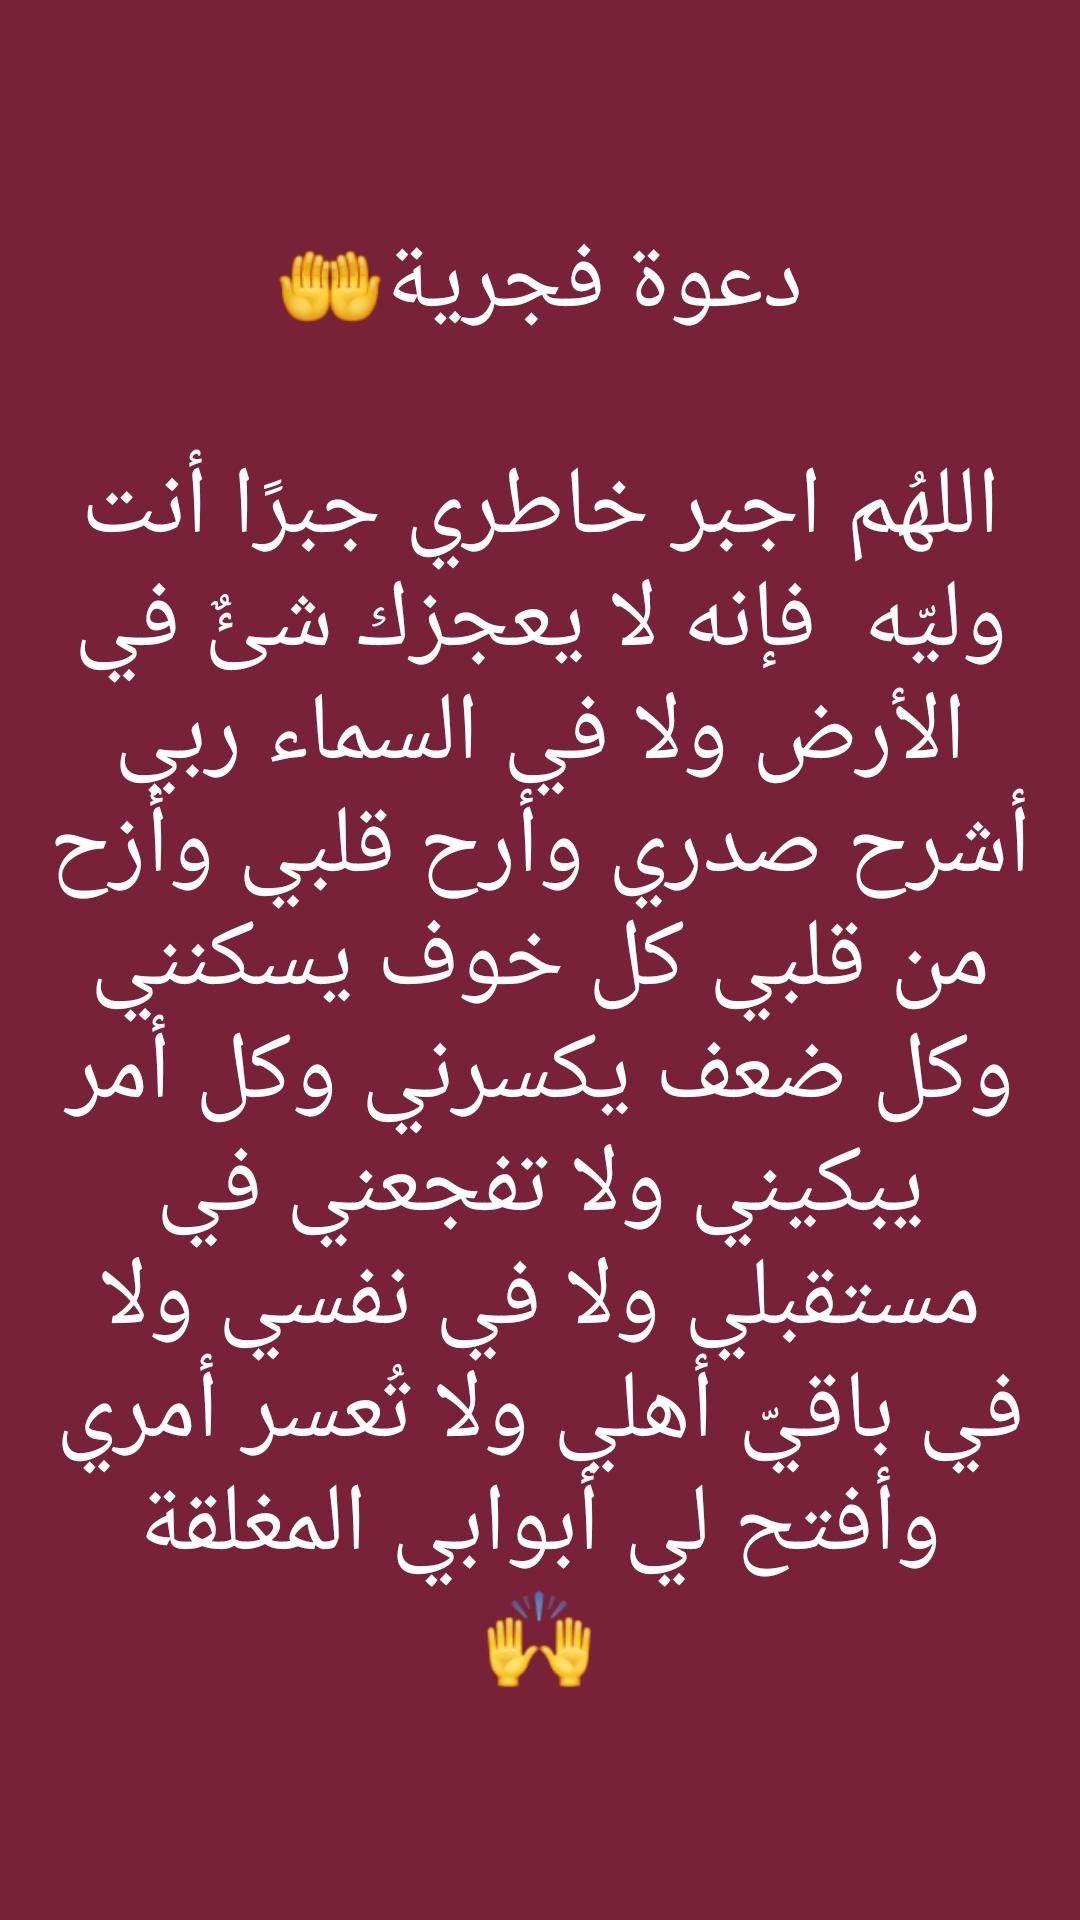 Pin By Lyan Hitham On Allah Duaa Islam Islamic Quotes Islam